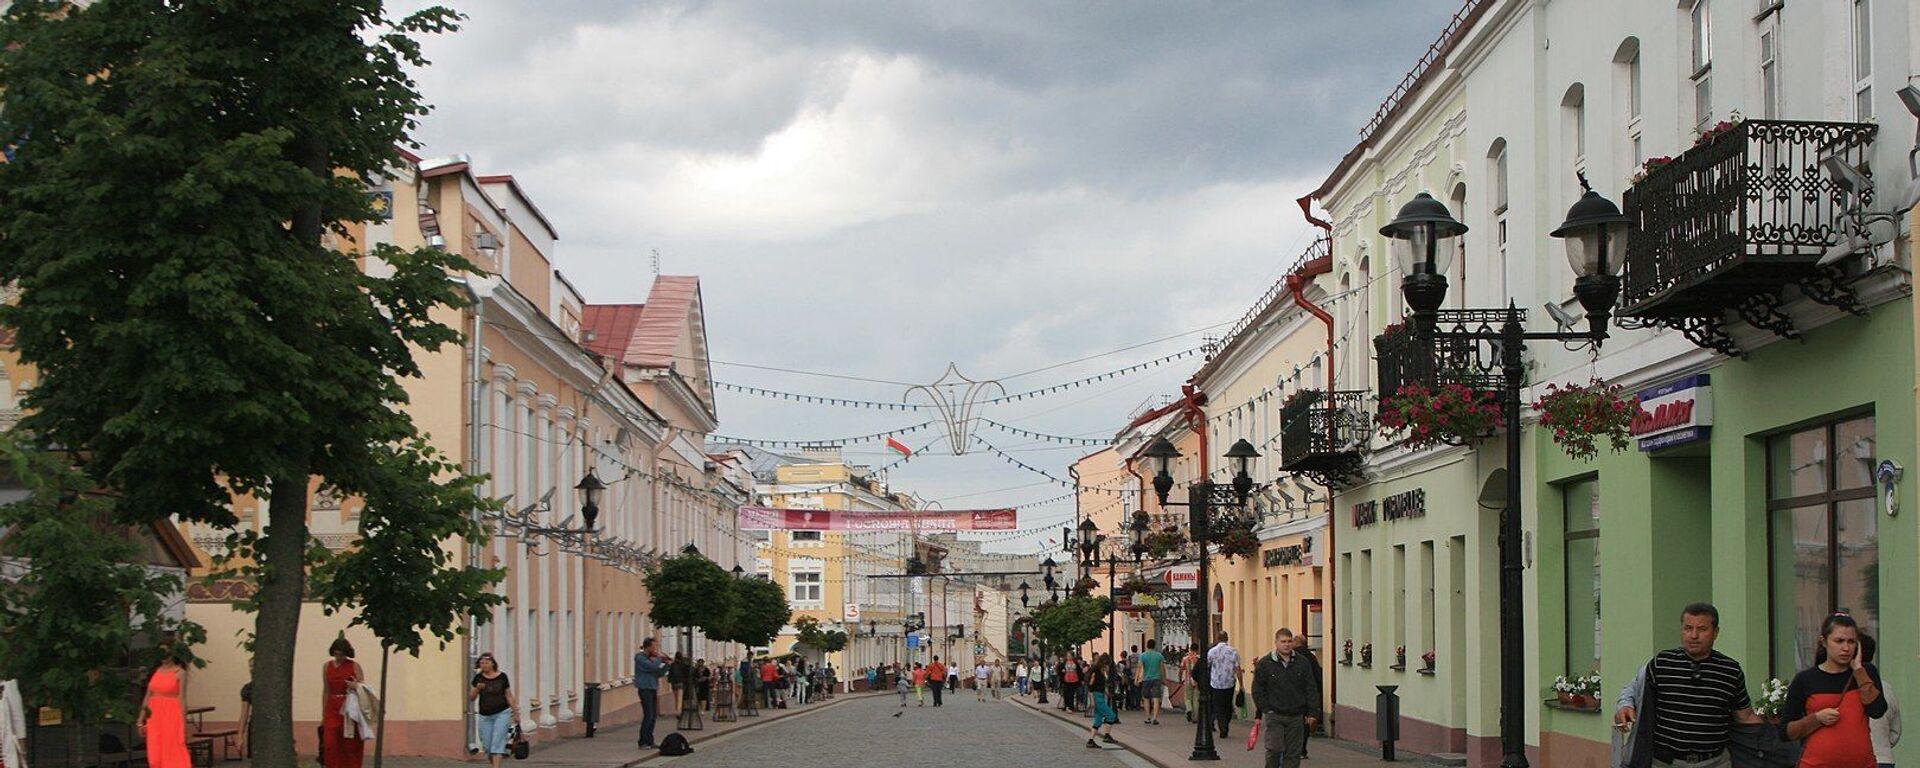 Grodno, Białoruś - Sputnik Polska, 1920, 29.03.2021